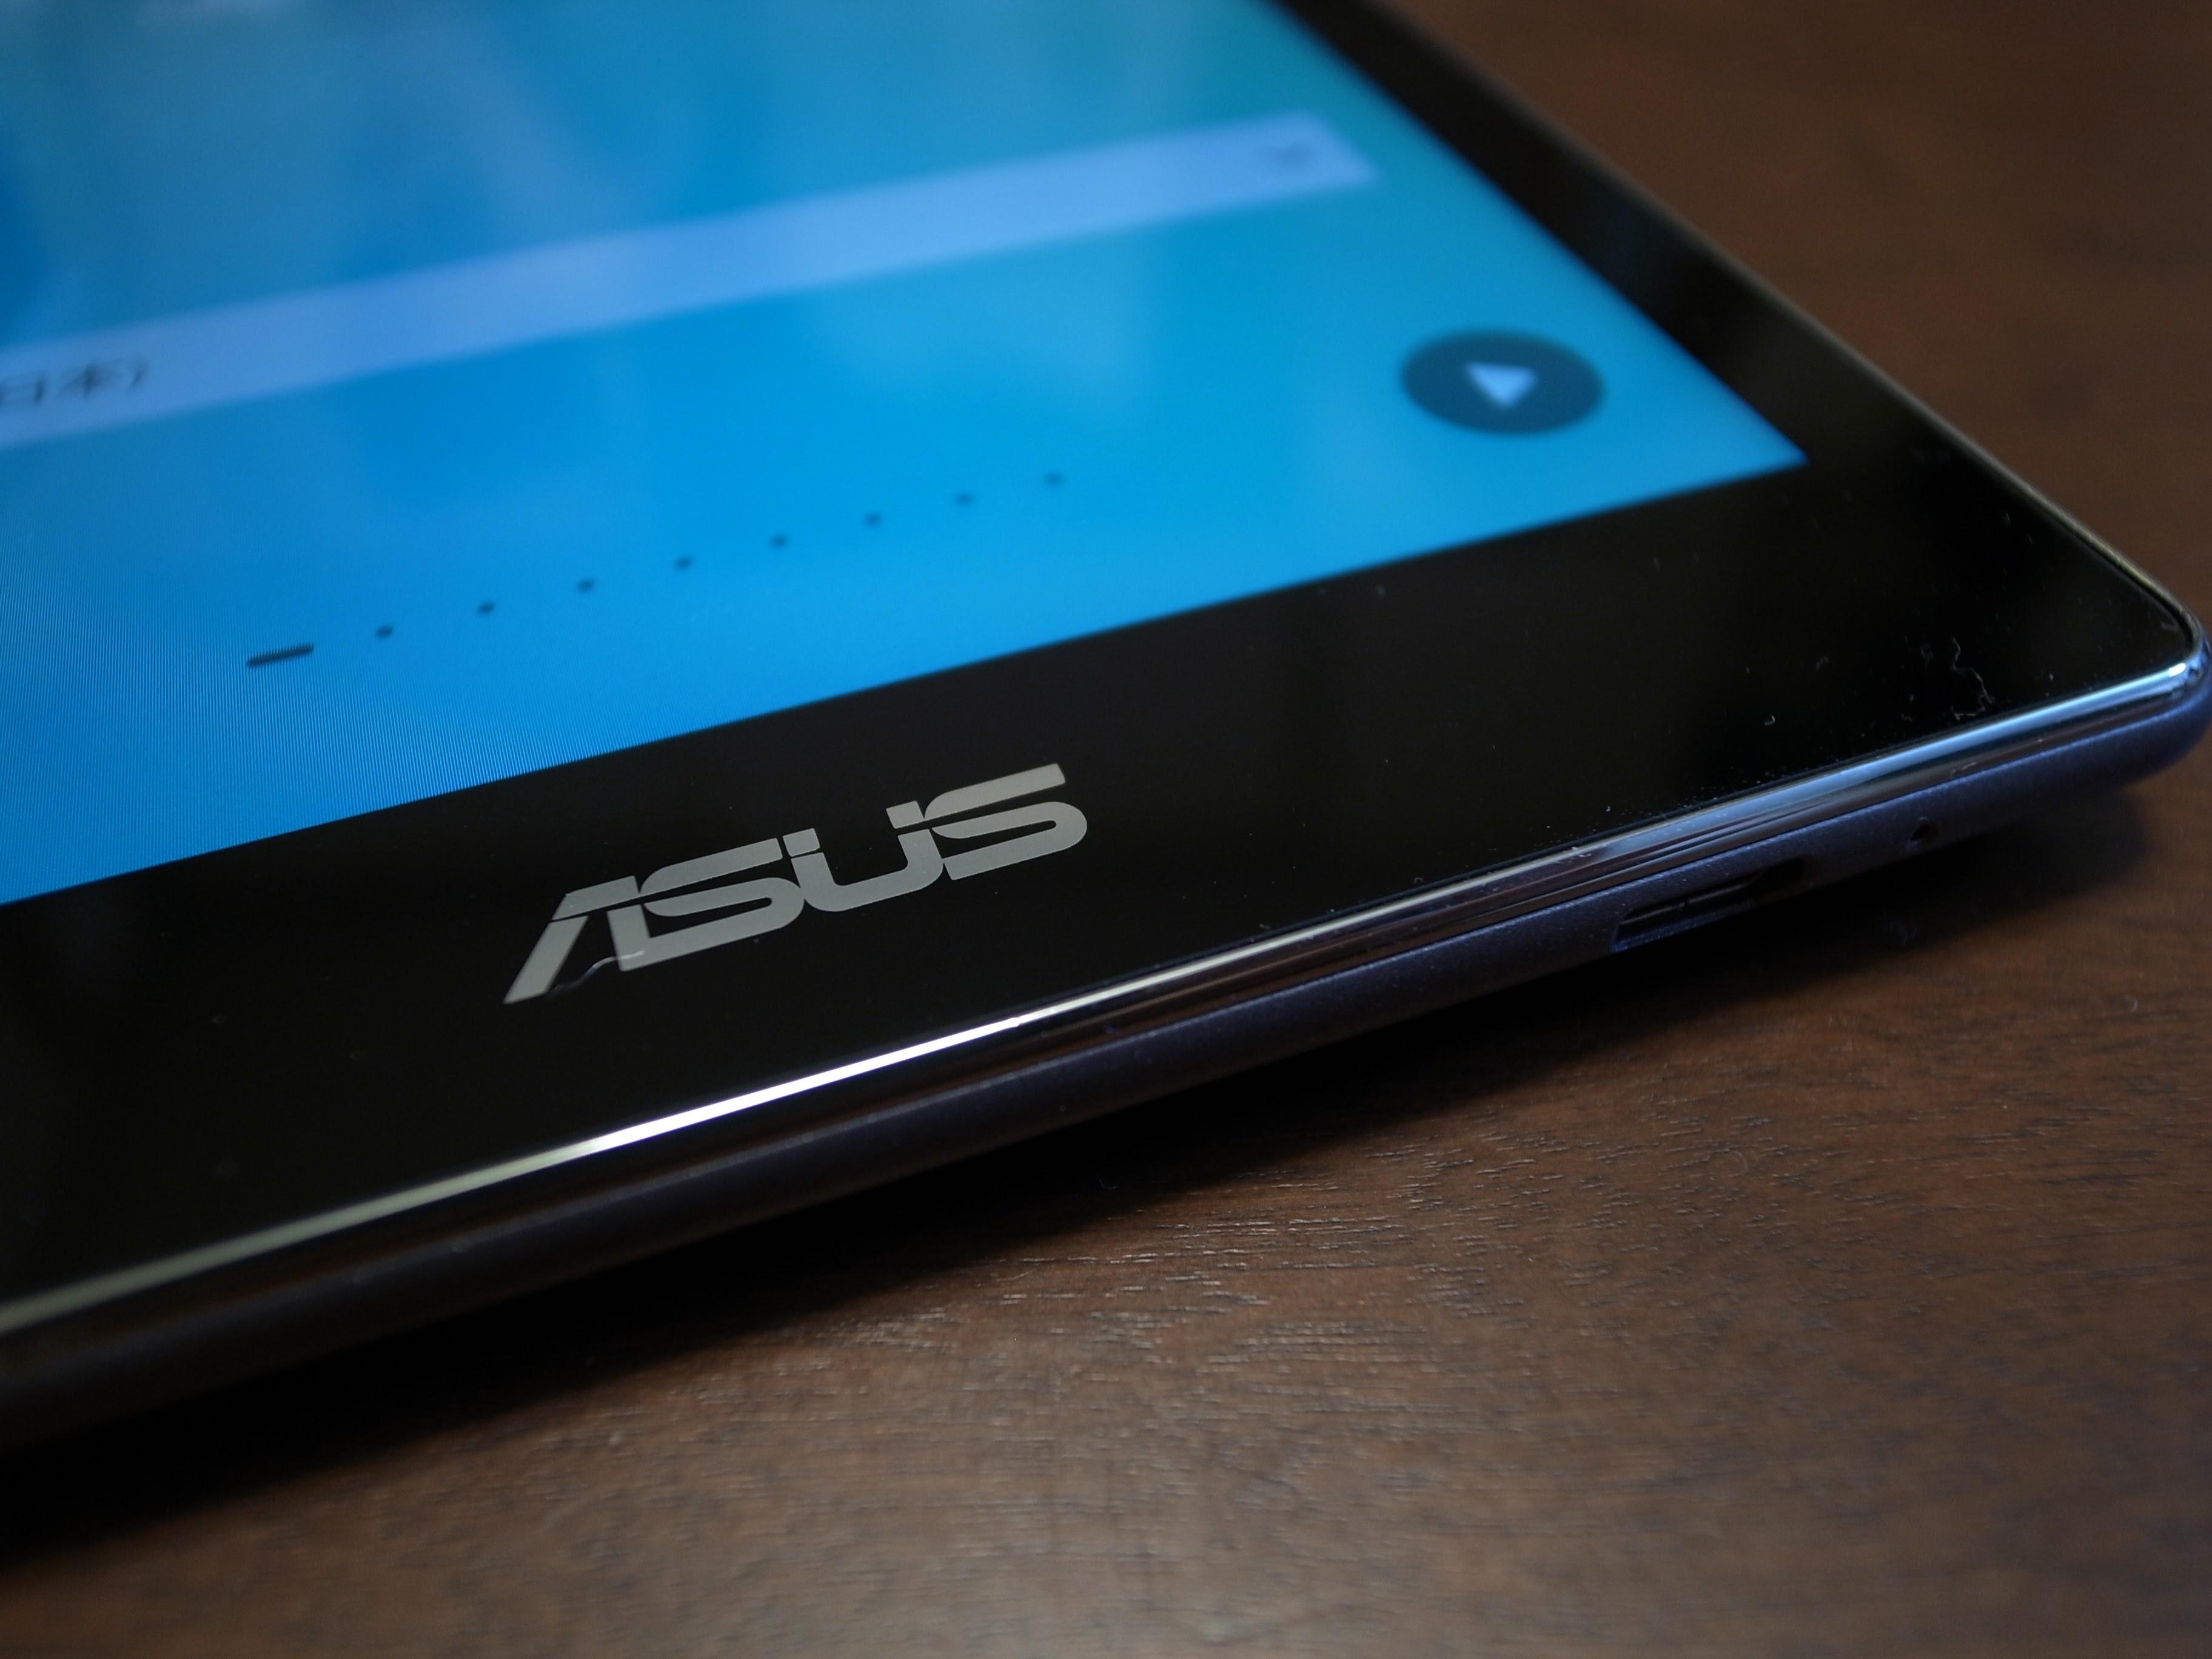 1005-201508_ASUS ZenPad Z370C 10